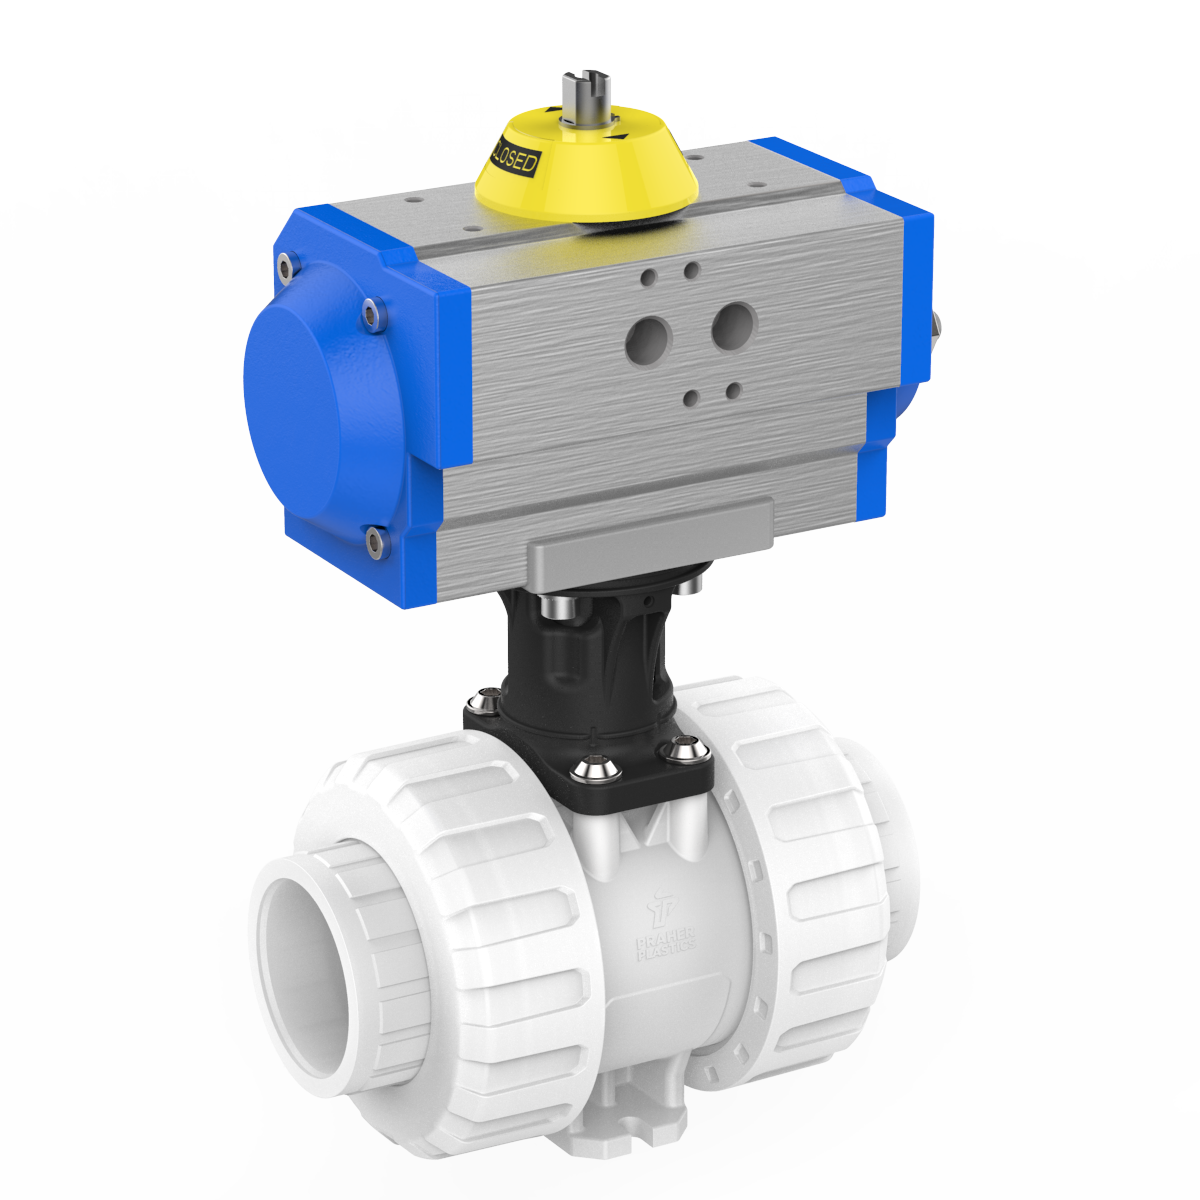 Praher 2-way Ball Valve M1 PVDF pneumatic actuator, white, black grey, blue and yellow